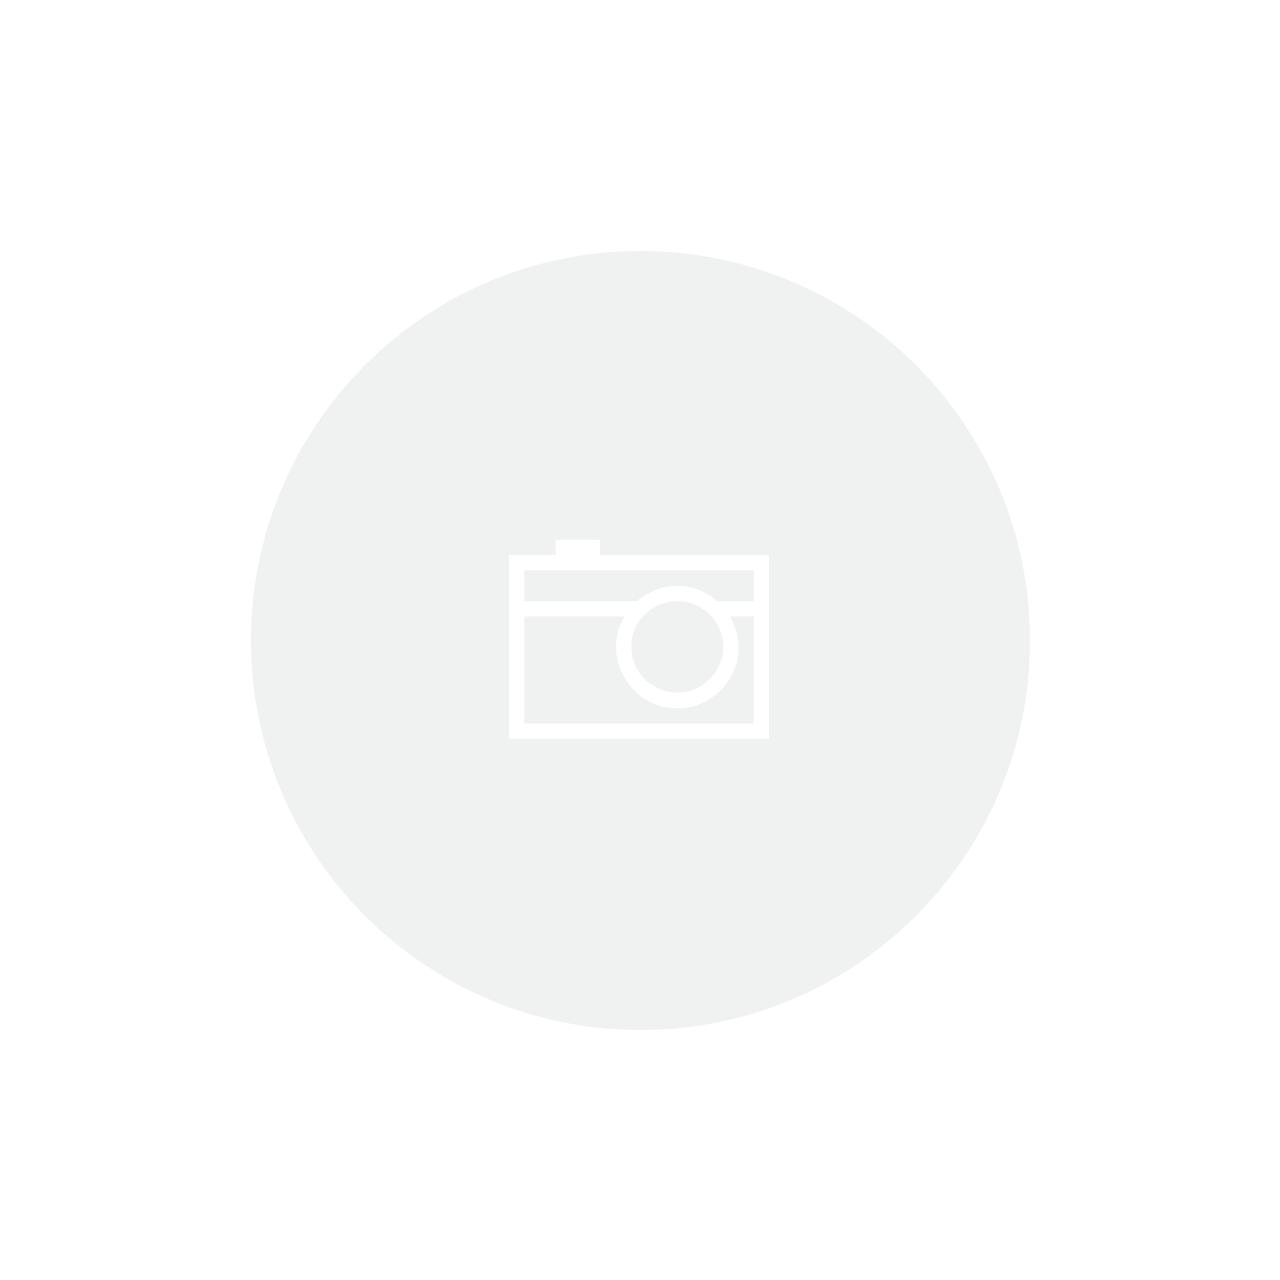 KIT P/ LIMPEZA DE CORRENTEC/DESENG.LUB.FINISHLINE (60ml)